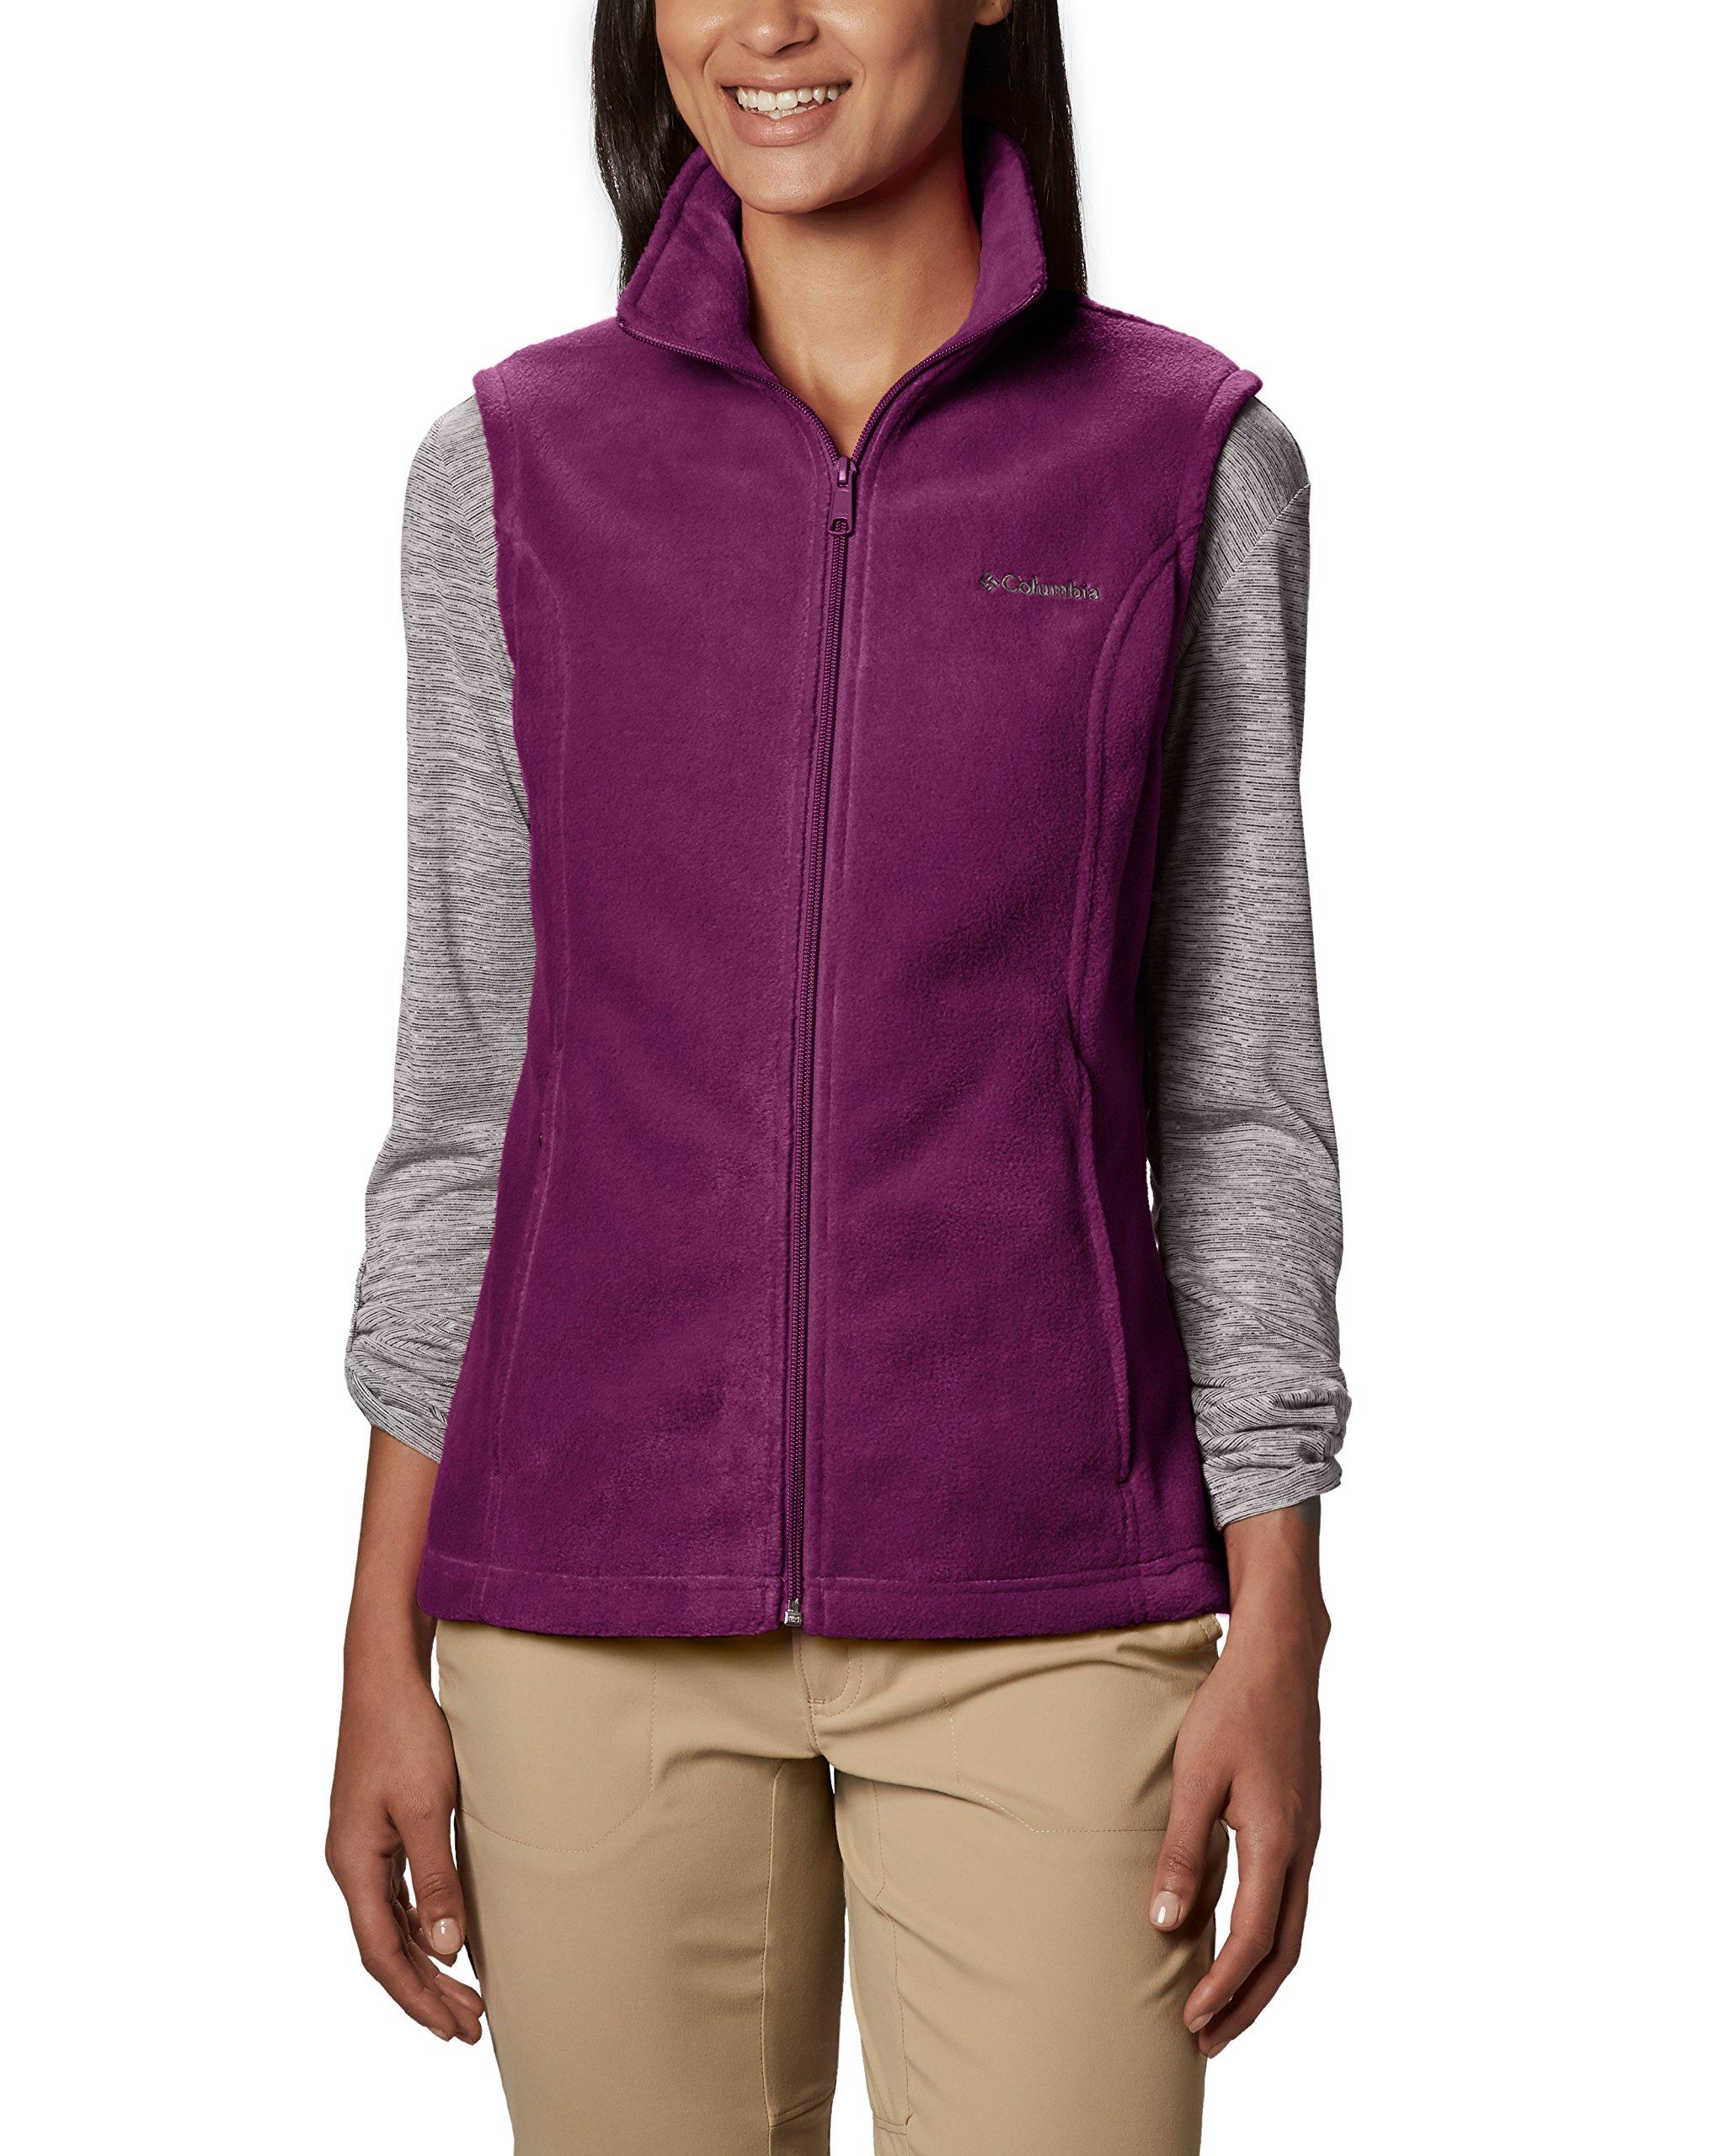 Columbia Women's Benton Springs Soft Fleece Vest, Dark Raspberry, Large by Columbia